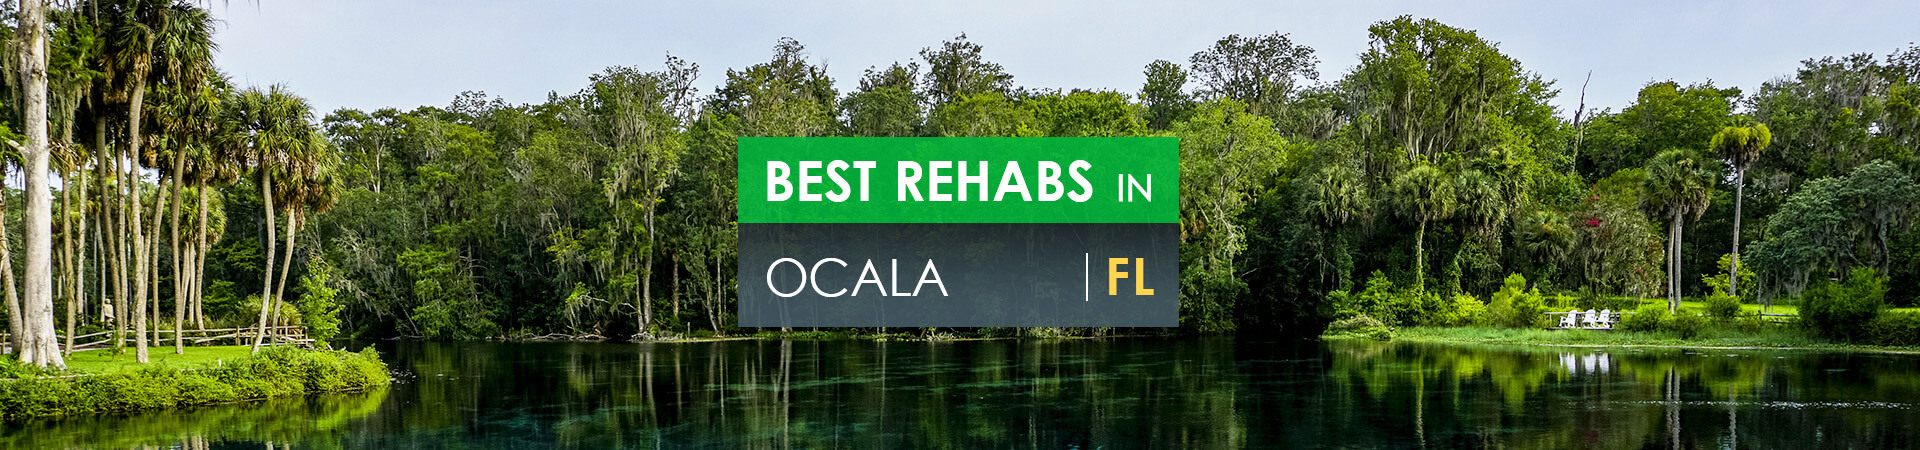 Best rehabs in Ocala, FL